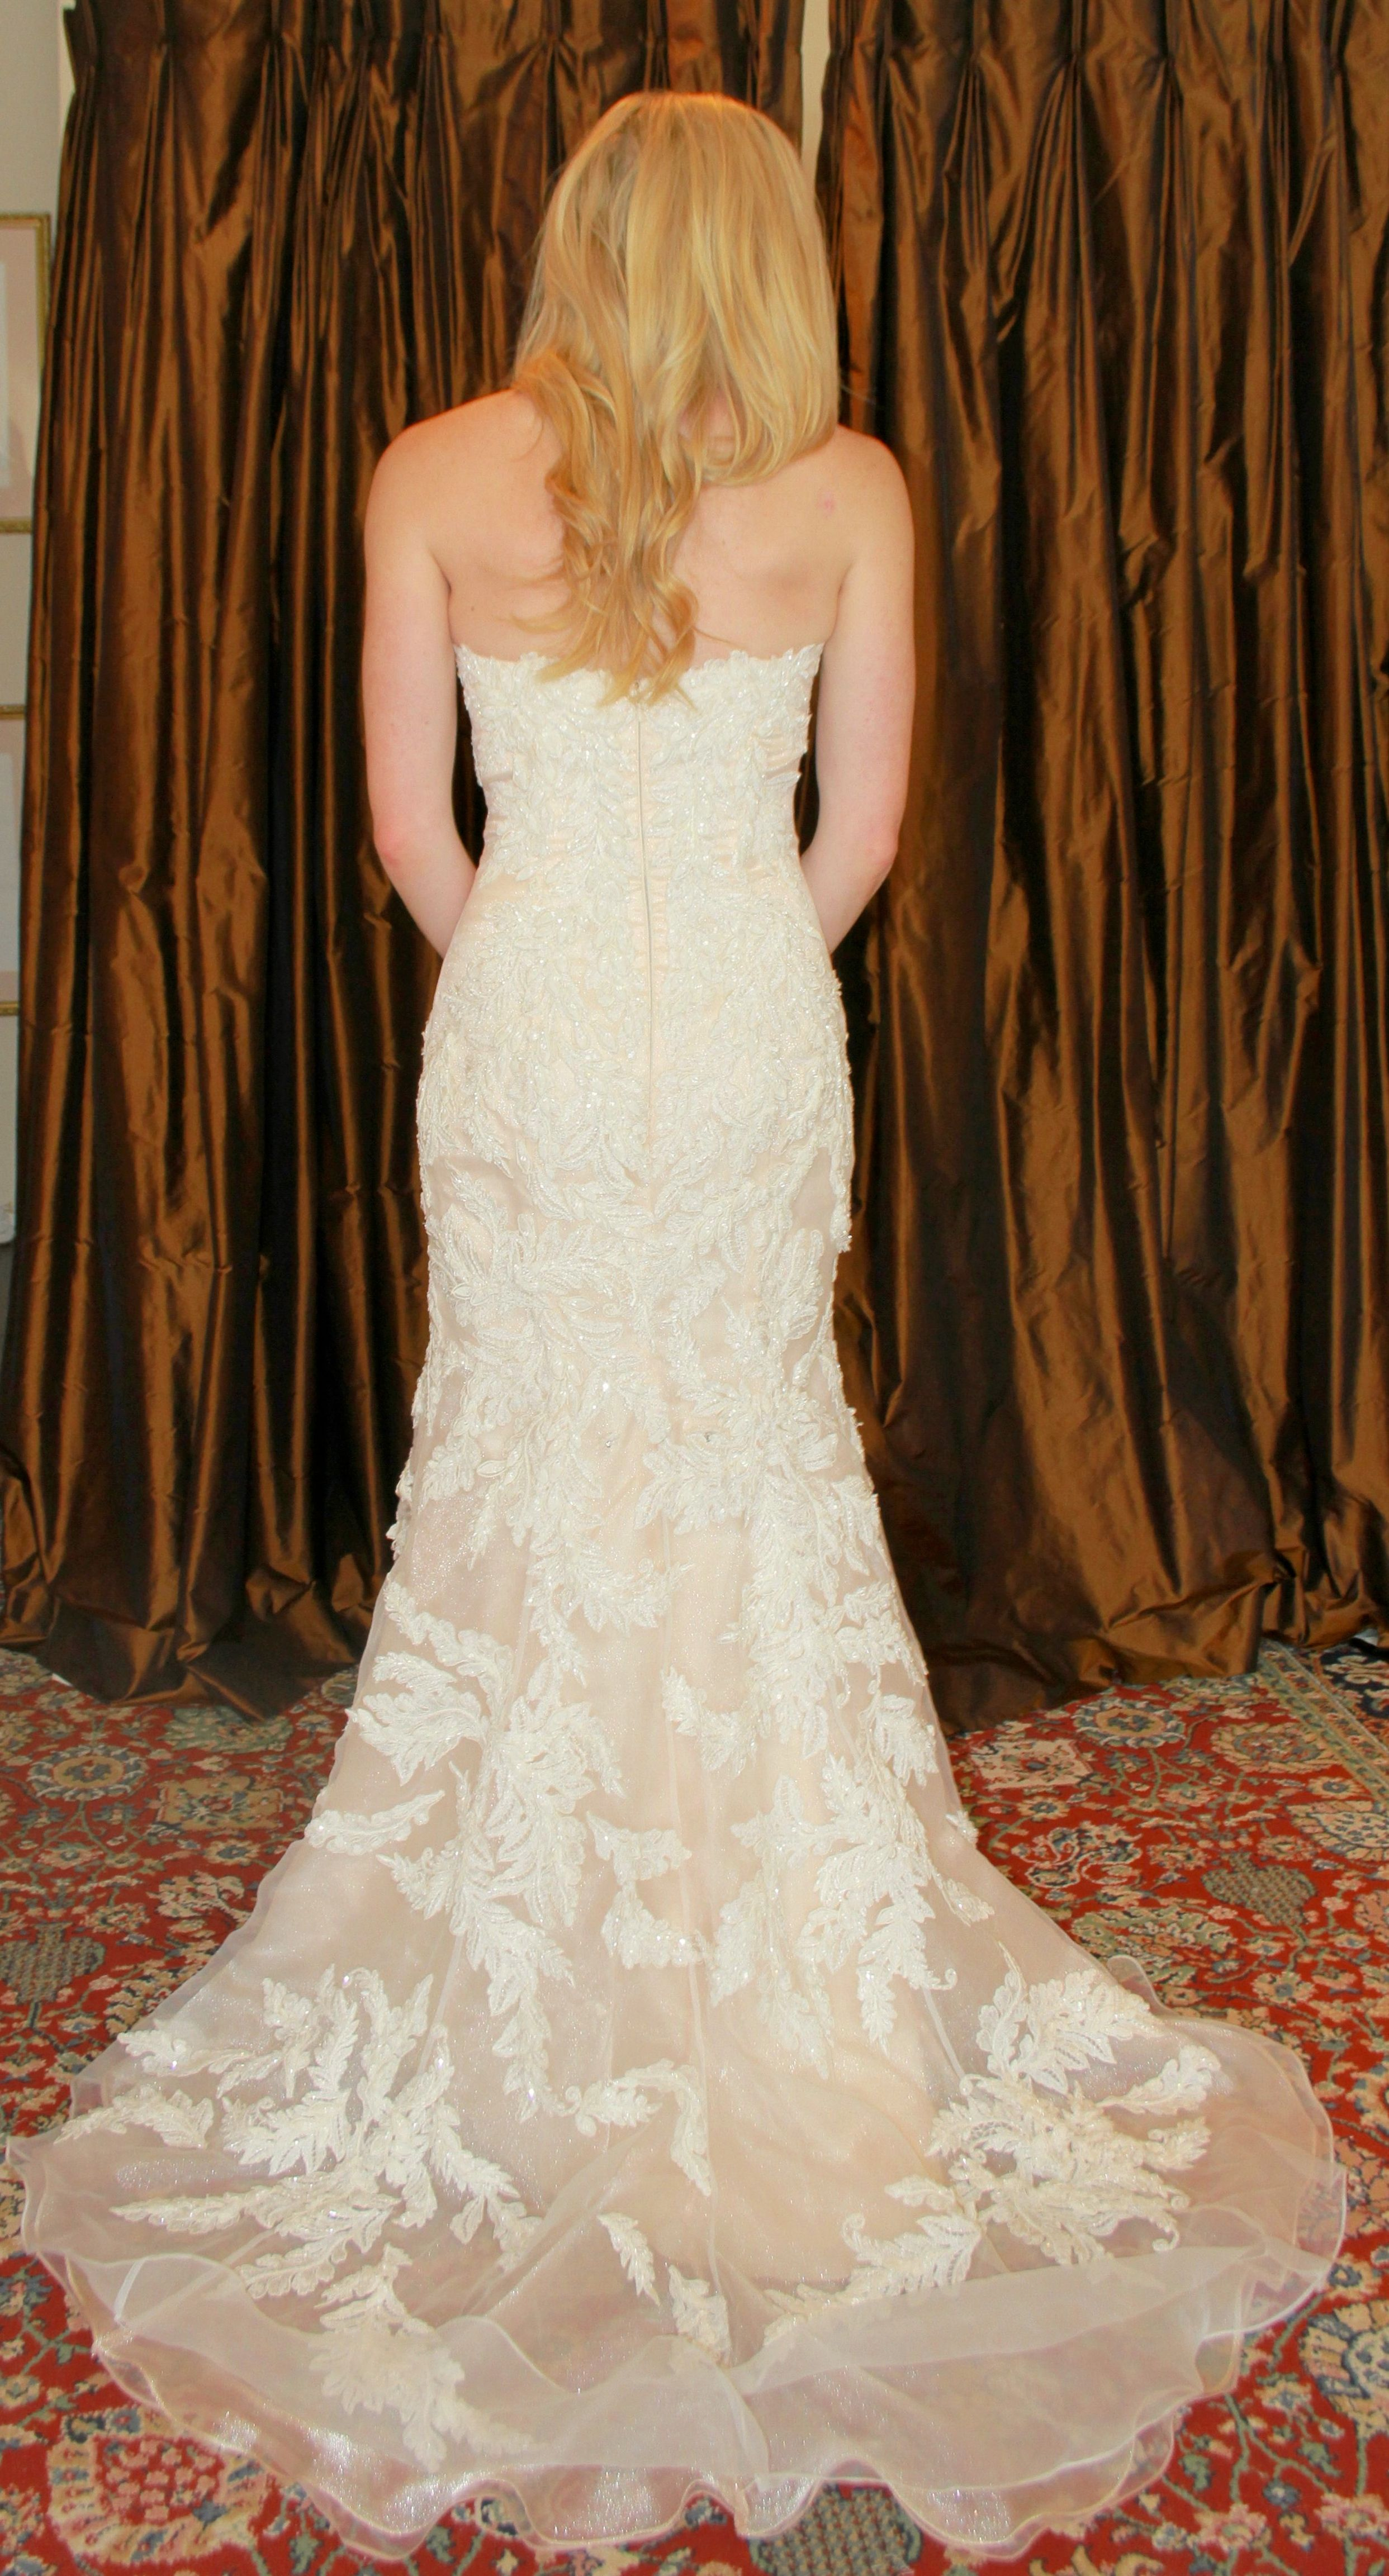 Stephen Yearick Ysa Makino 3117 Size 4 Wedding Dress   Wedding dress ...